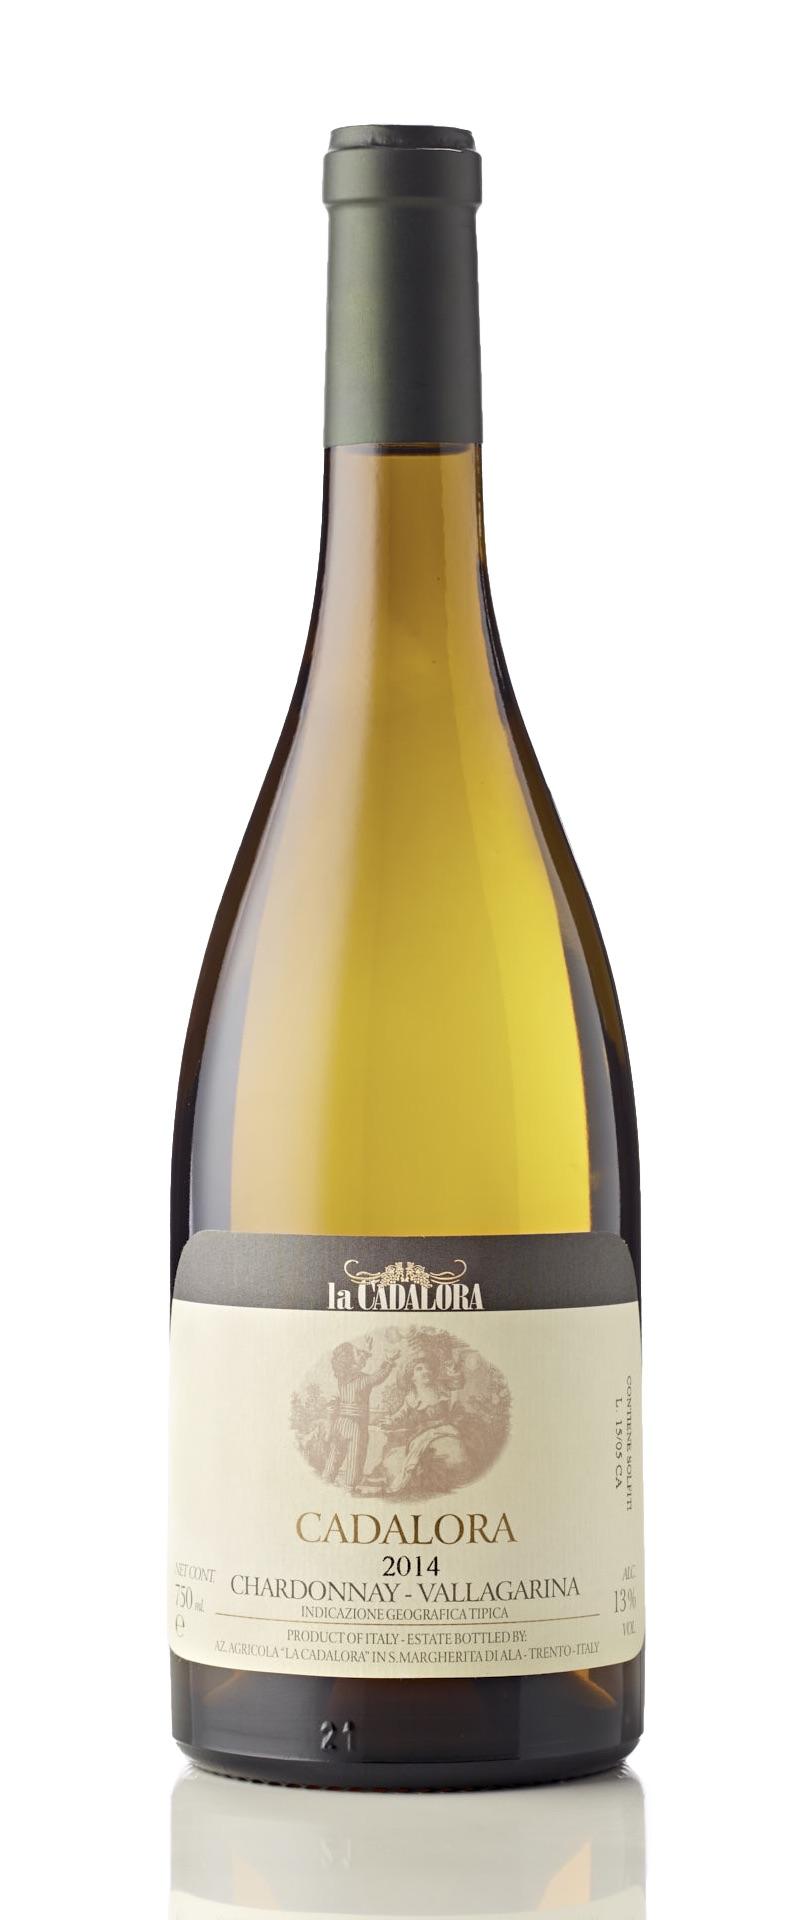 La Cadalora Cadalora Chardonnay Vallagarina IGT.jpg